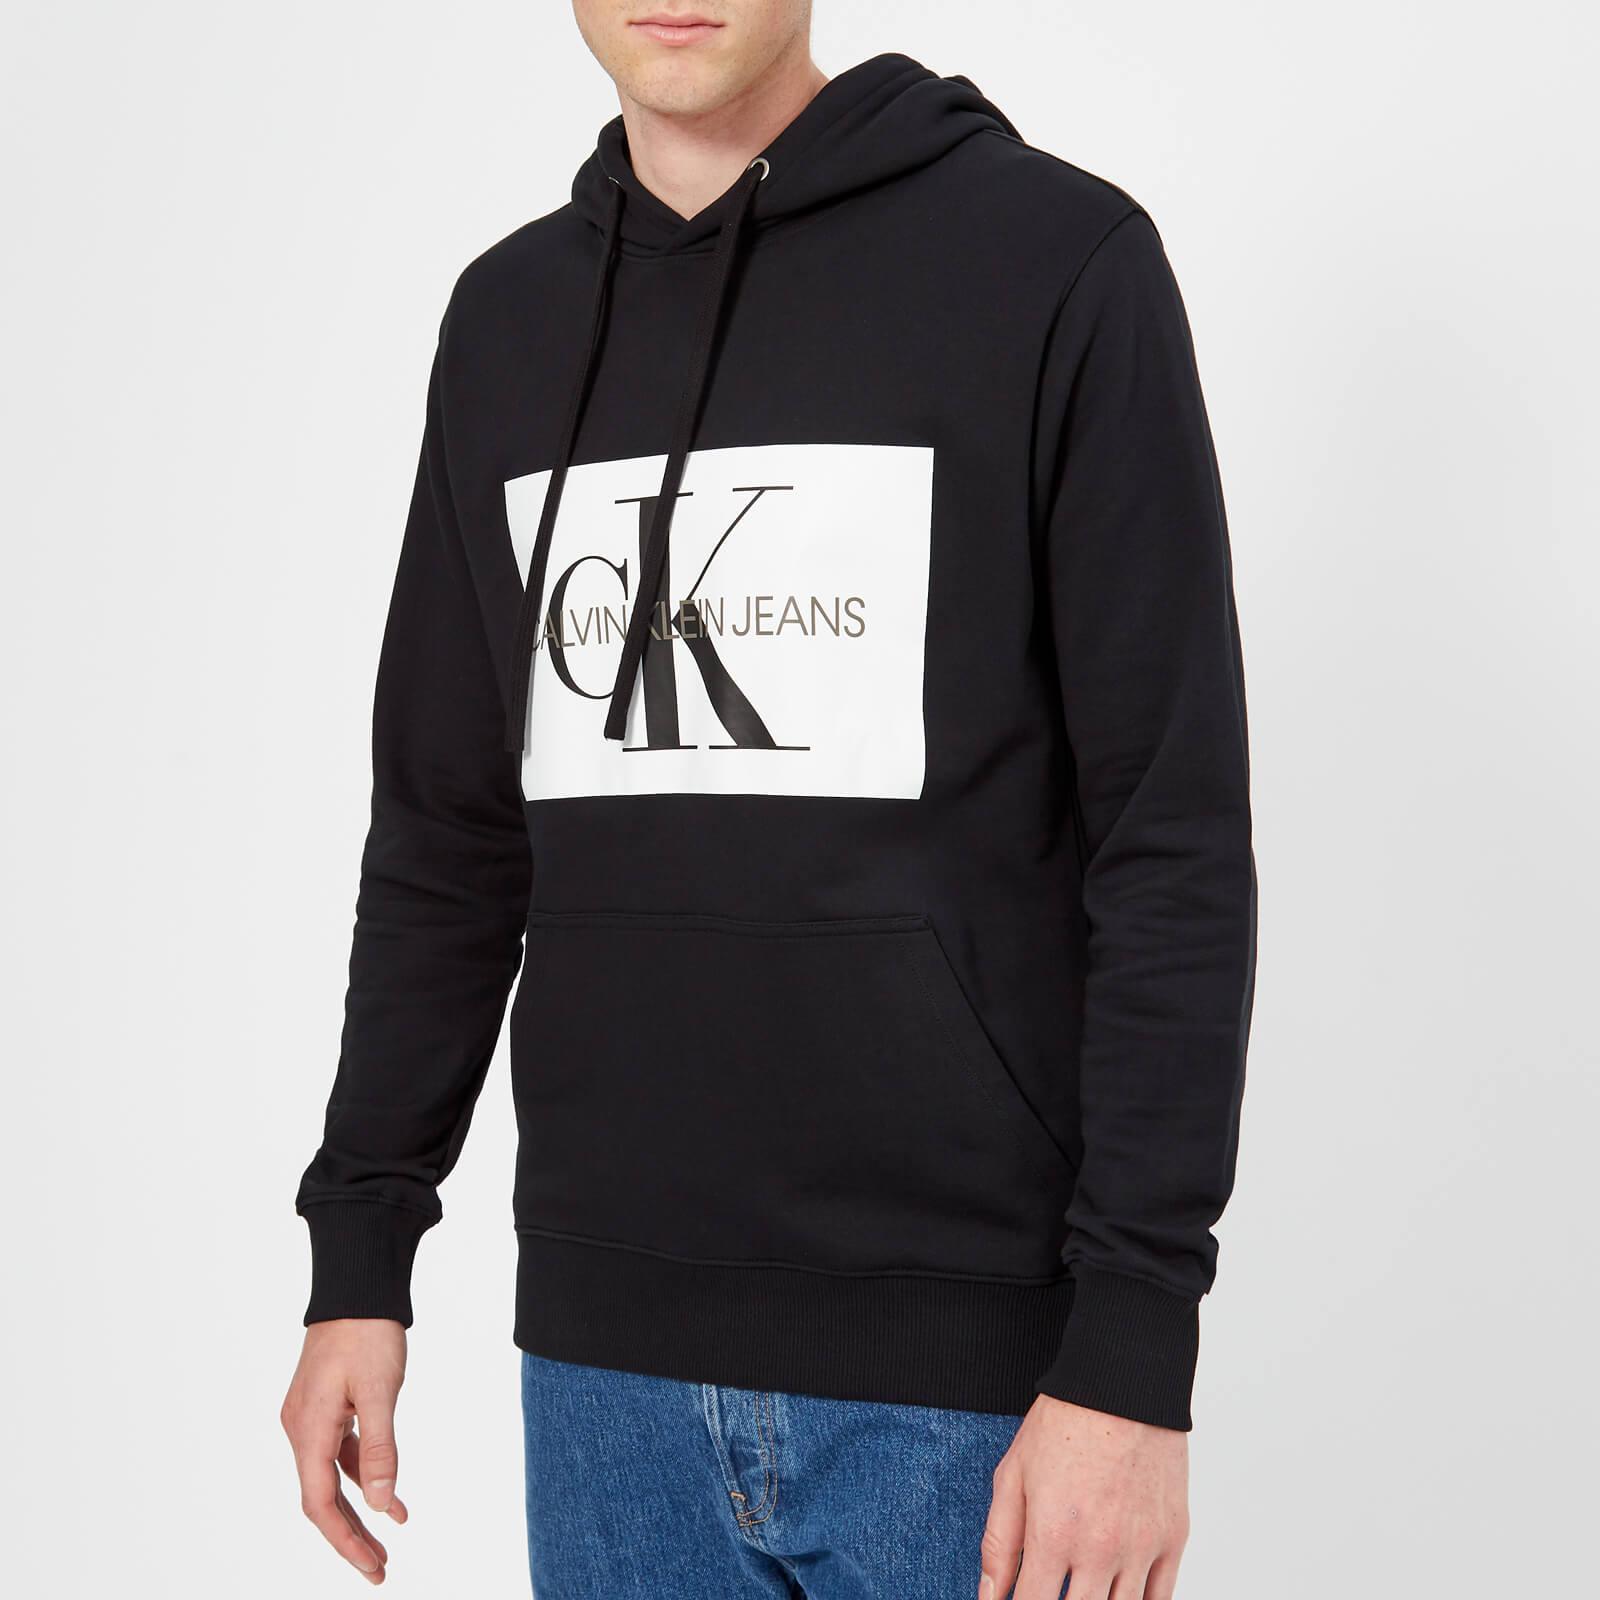 f4838759d0af Calvin Klein Jeans Men s Monogram Box Logo Hoody - CK Black Mens Clothing